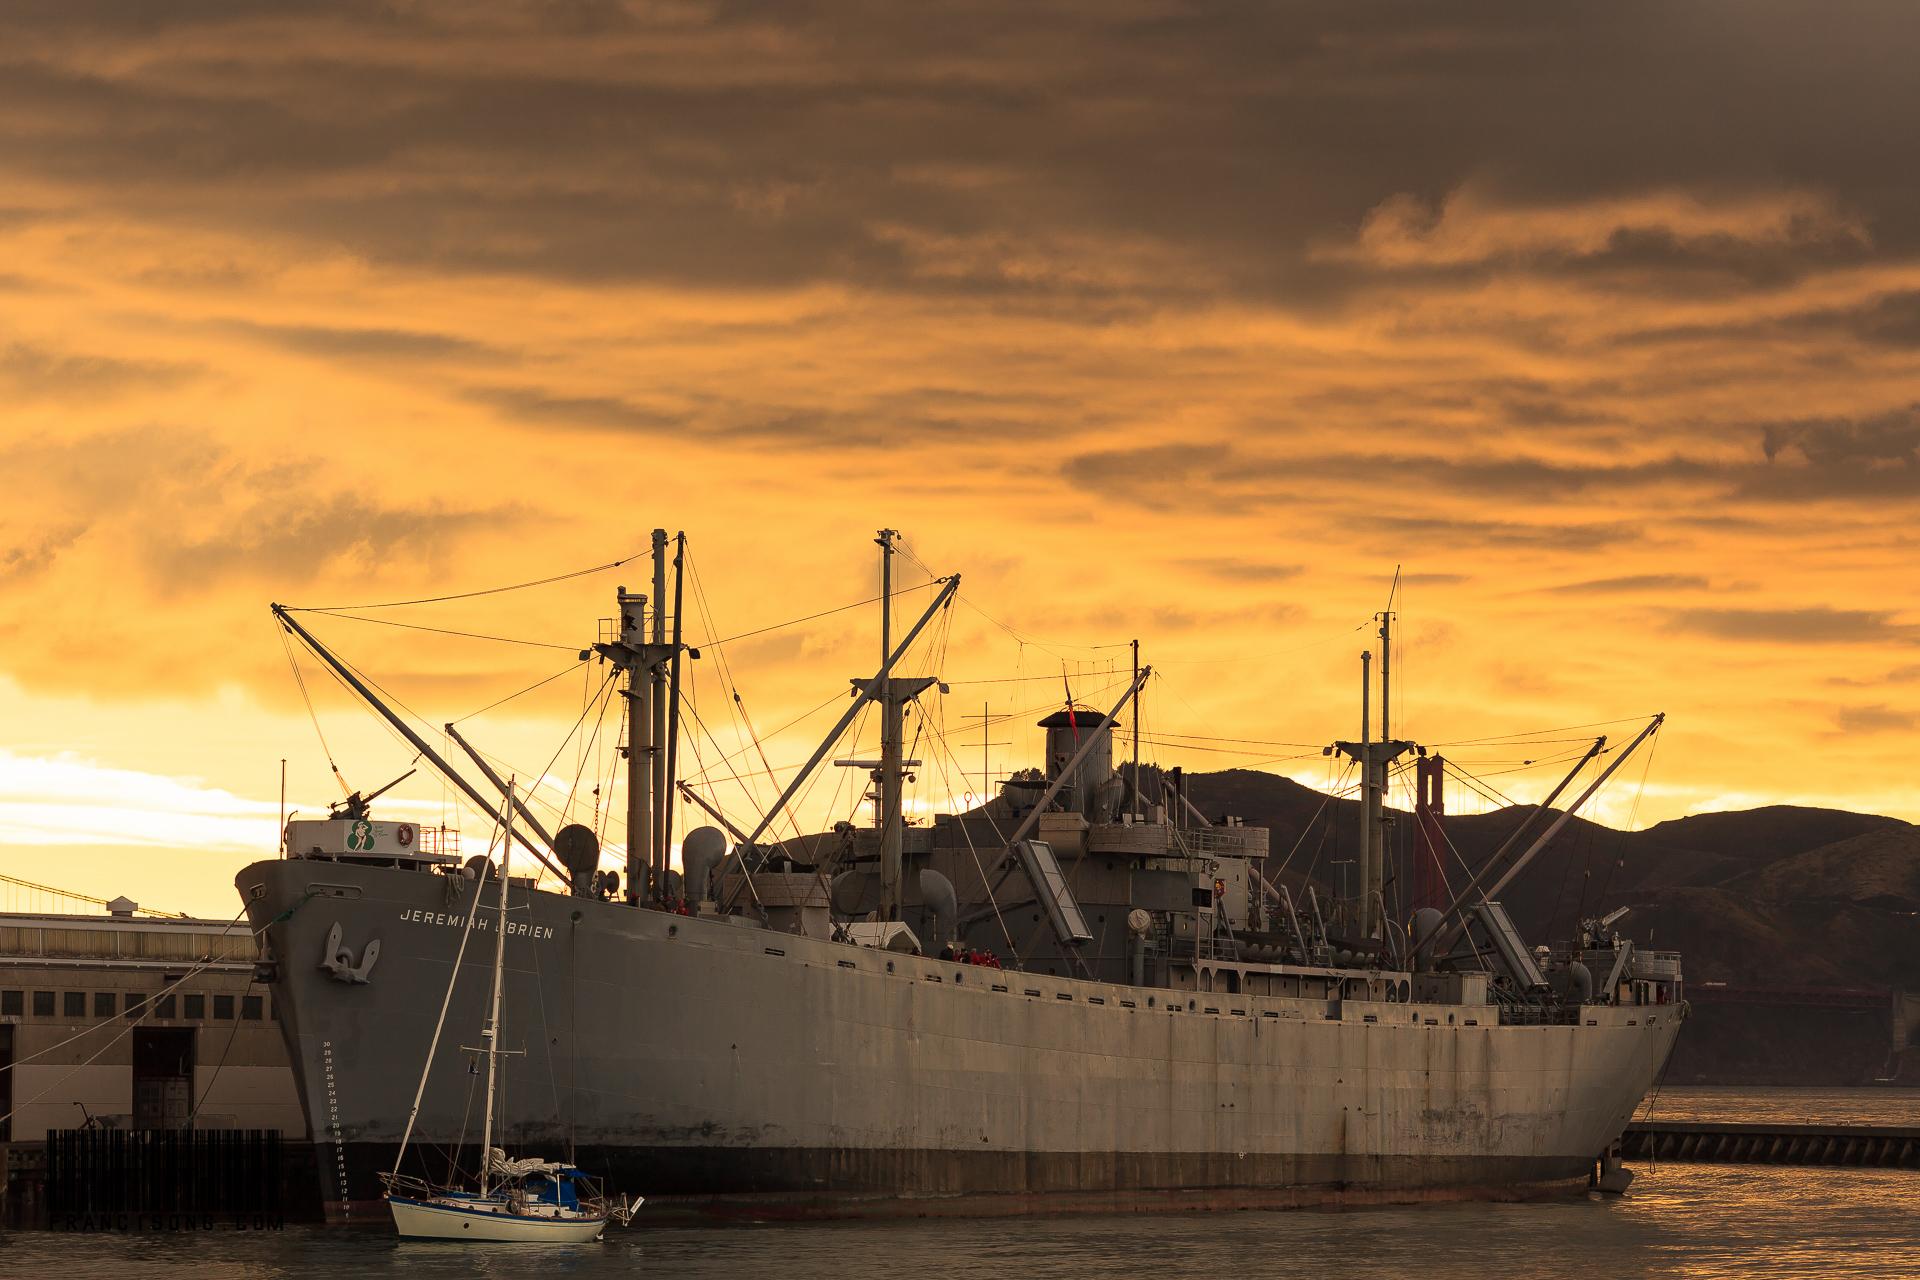 Old war ship docked at Pier 39